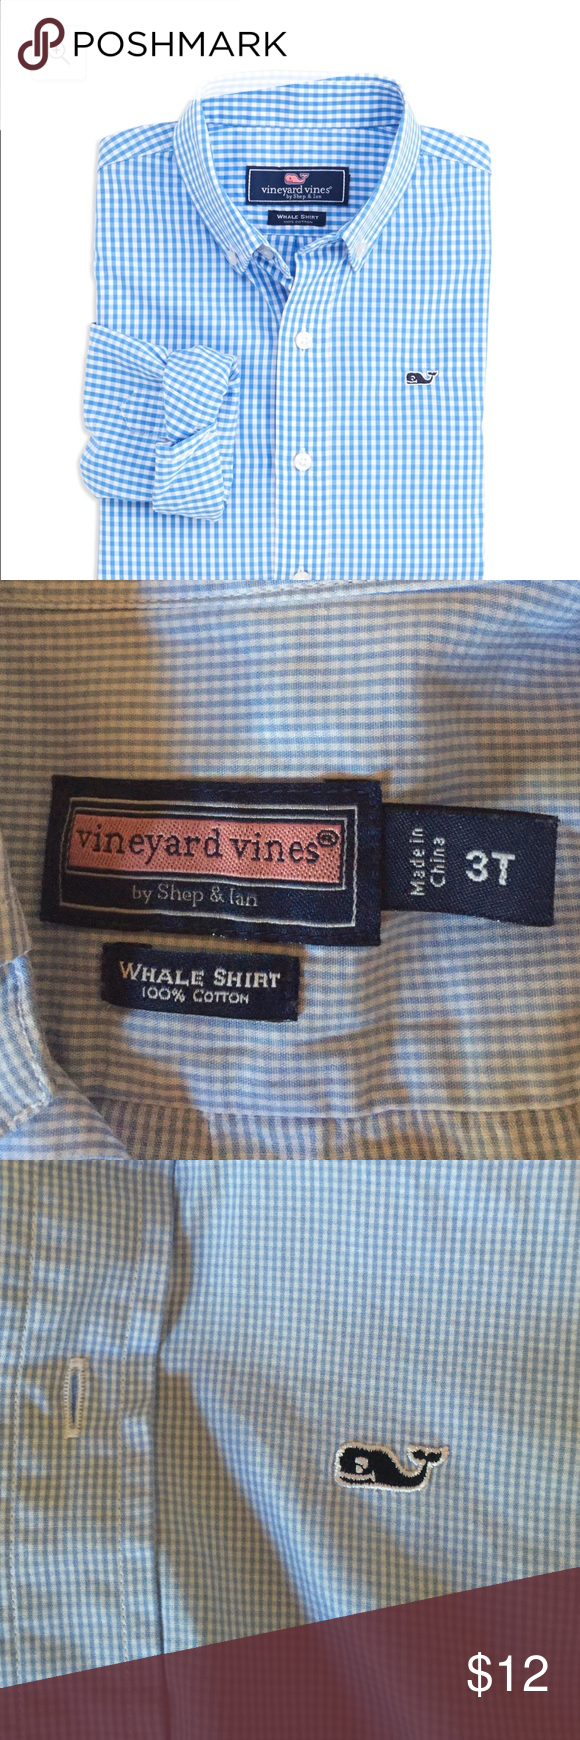 Boys Vineyard vines button down shirt Light blue gingham boys vineyard vines whale shirt Vineyard Vines Shirts & Tops Button Down Shirts